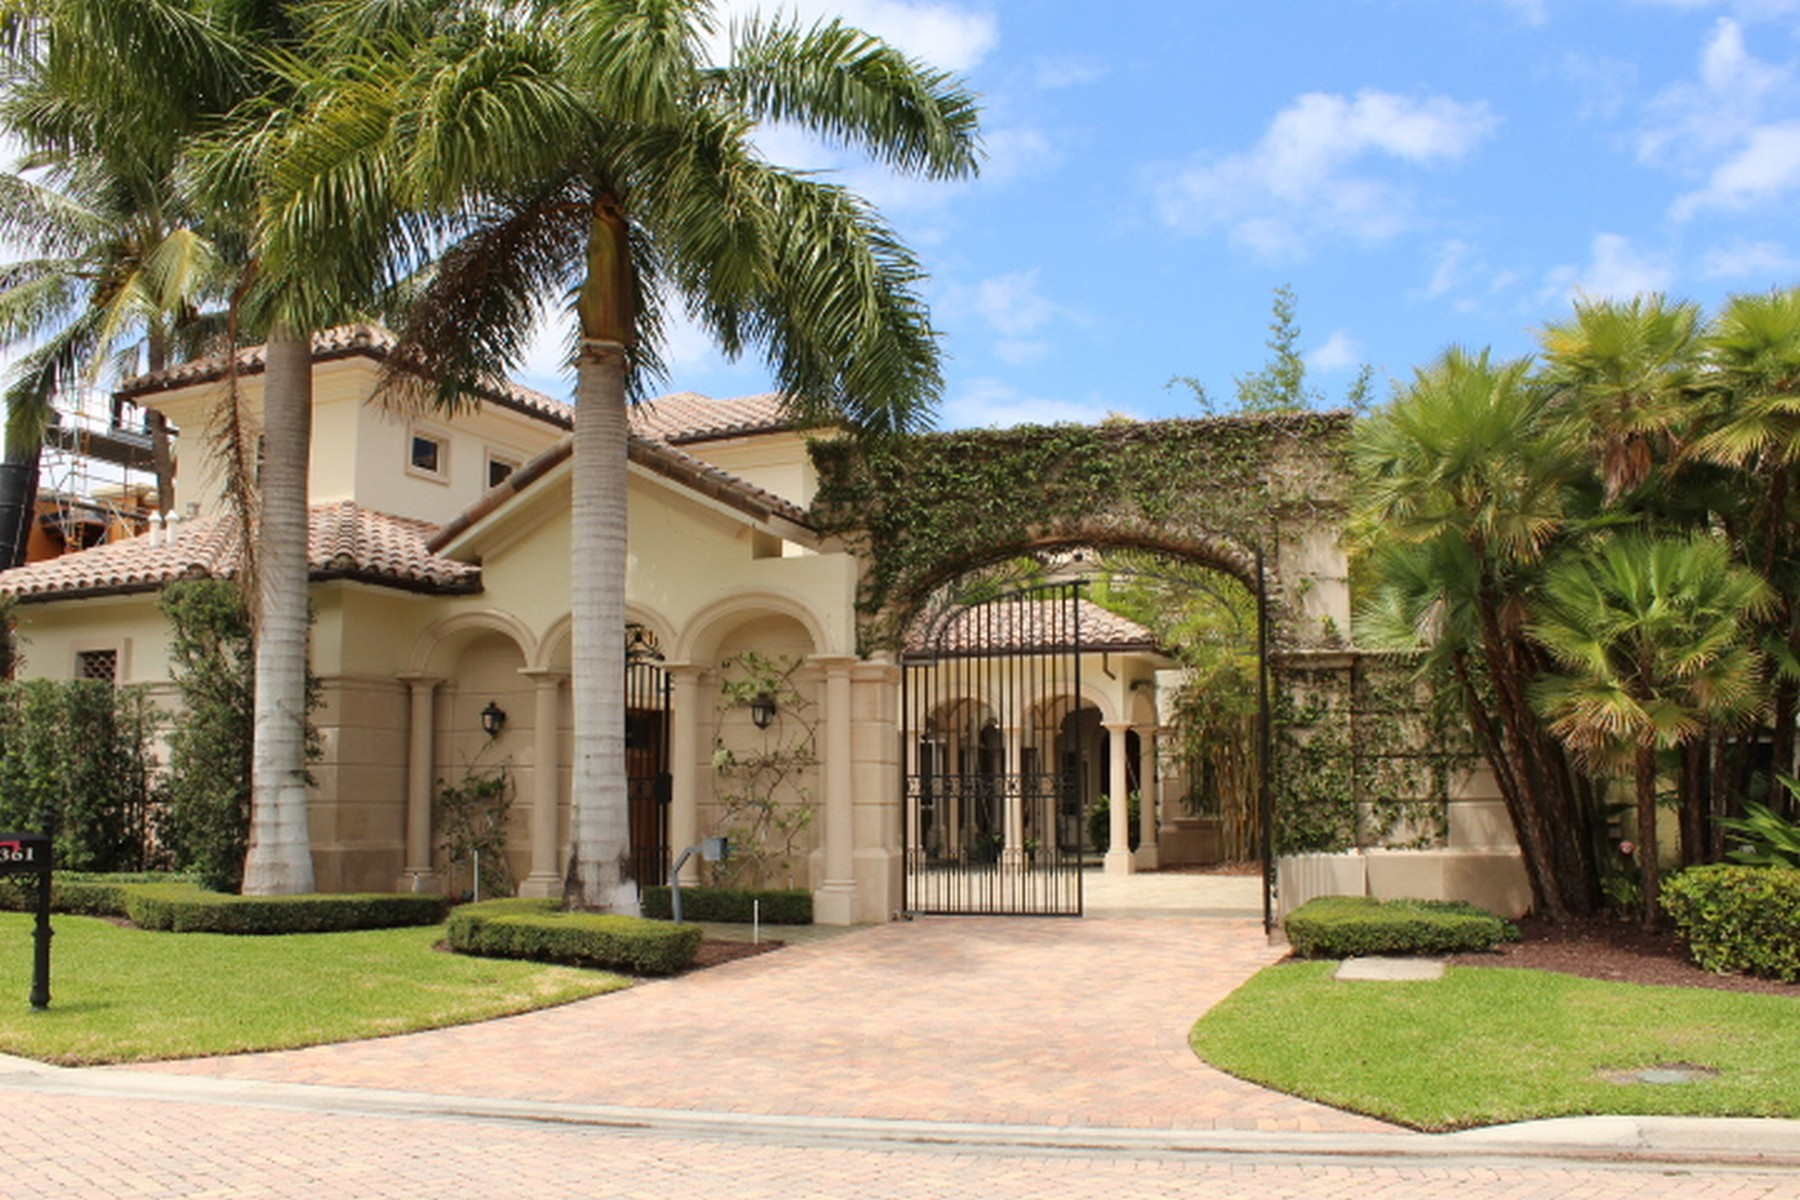 Single Family Home for Sale at 361 SE Mizner Lake Estates Dr , Boca Raton, FL 334 Boca Raton, Florida, 33432 United States